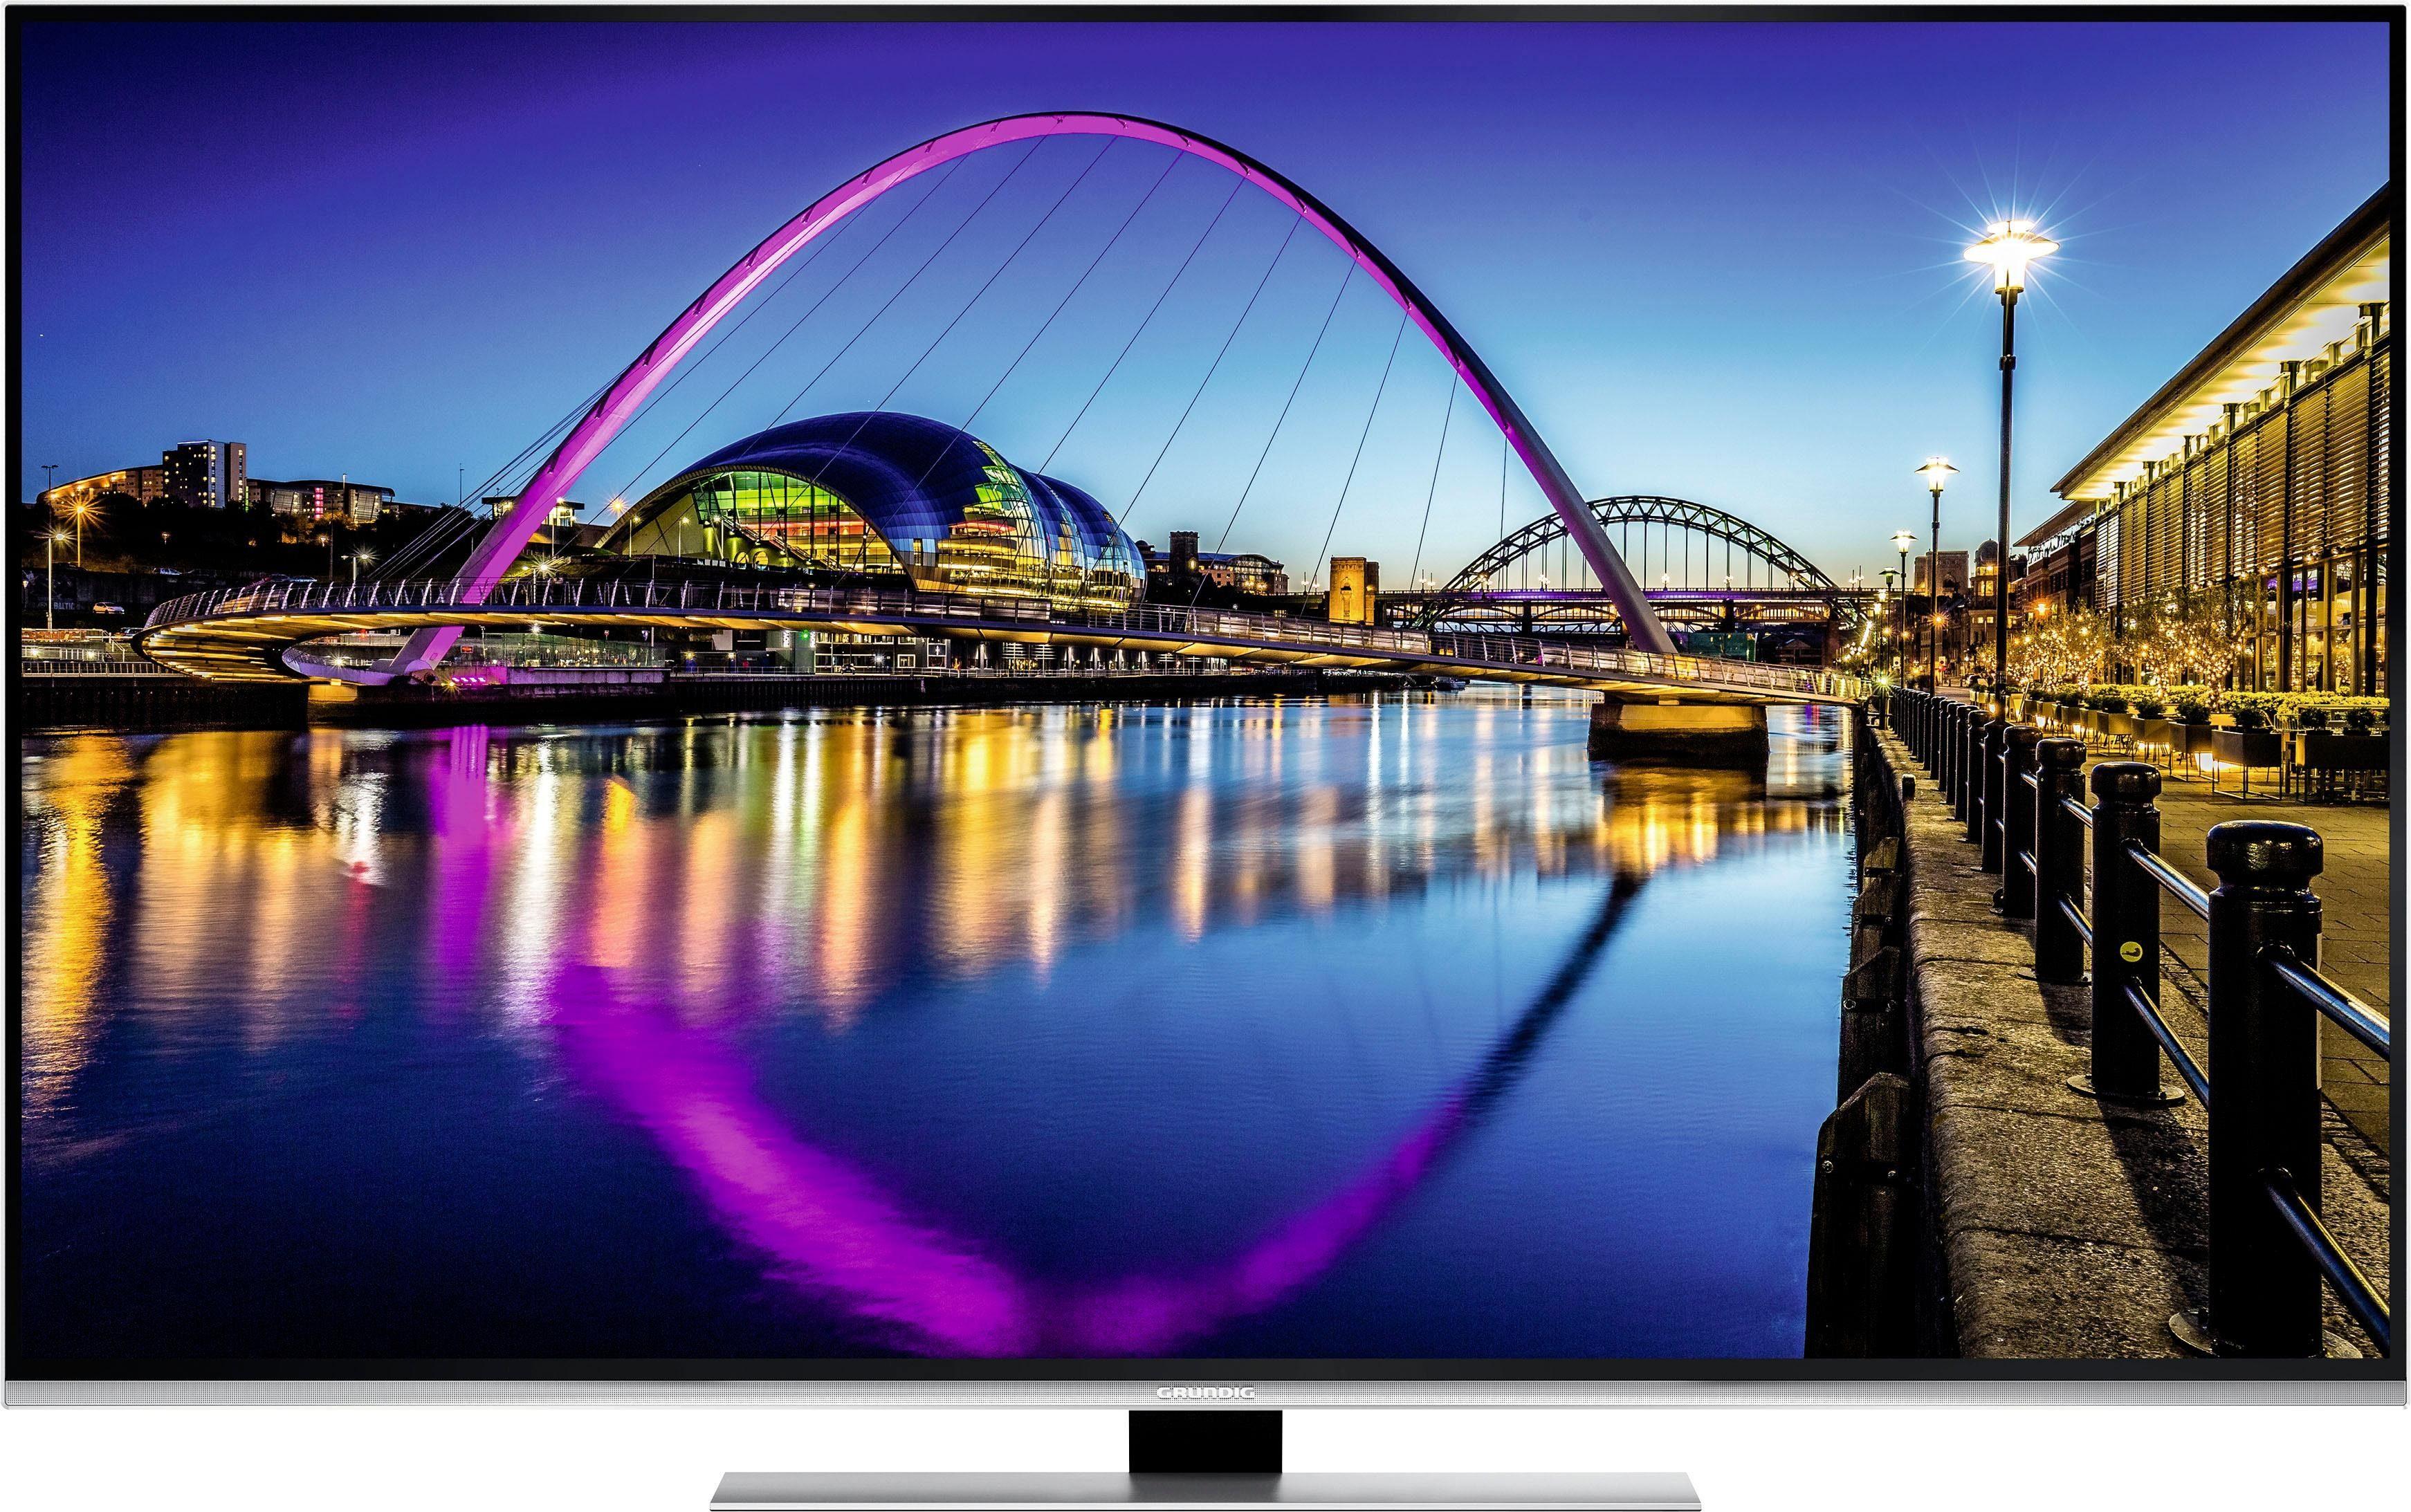 Grundig 55 GUS 9890 LED-Fernseher (55 Zoll, 4K Ultra HD, Smart-TV)